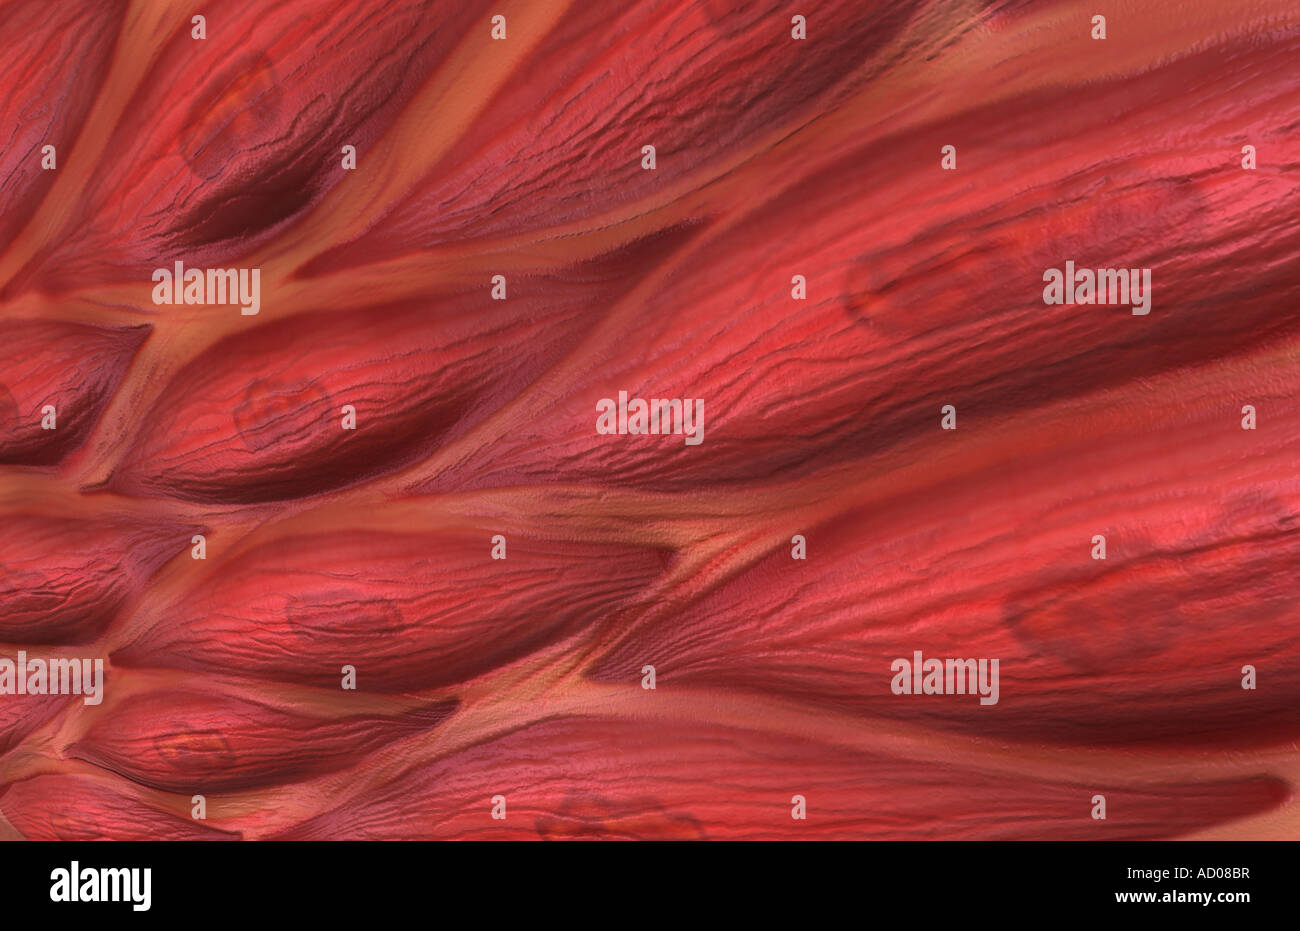 Tejido muscular liso Foto & Imagen De Stock: 13261834 - Alamy